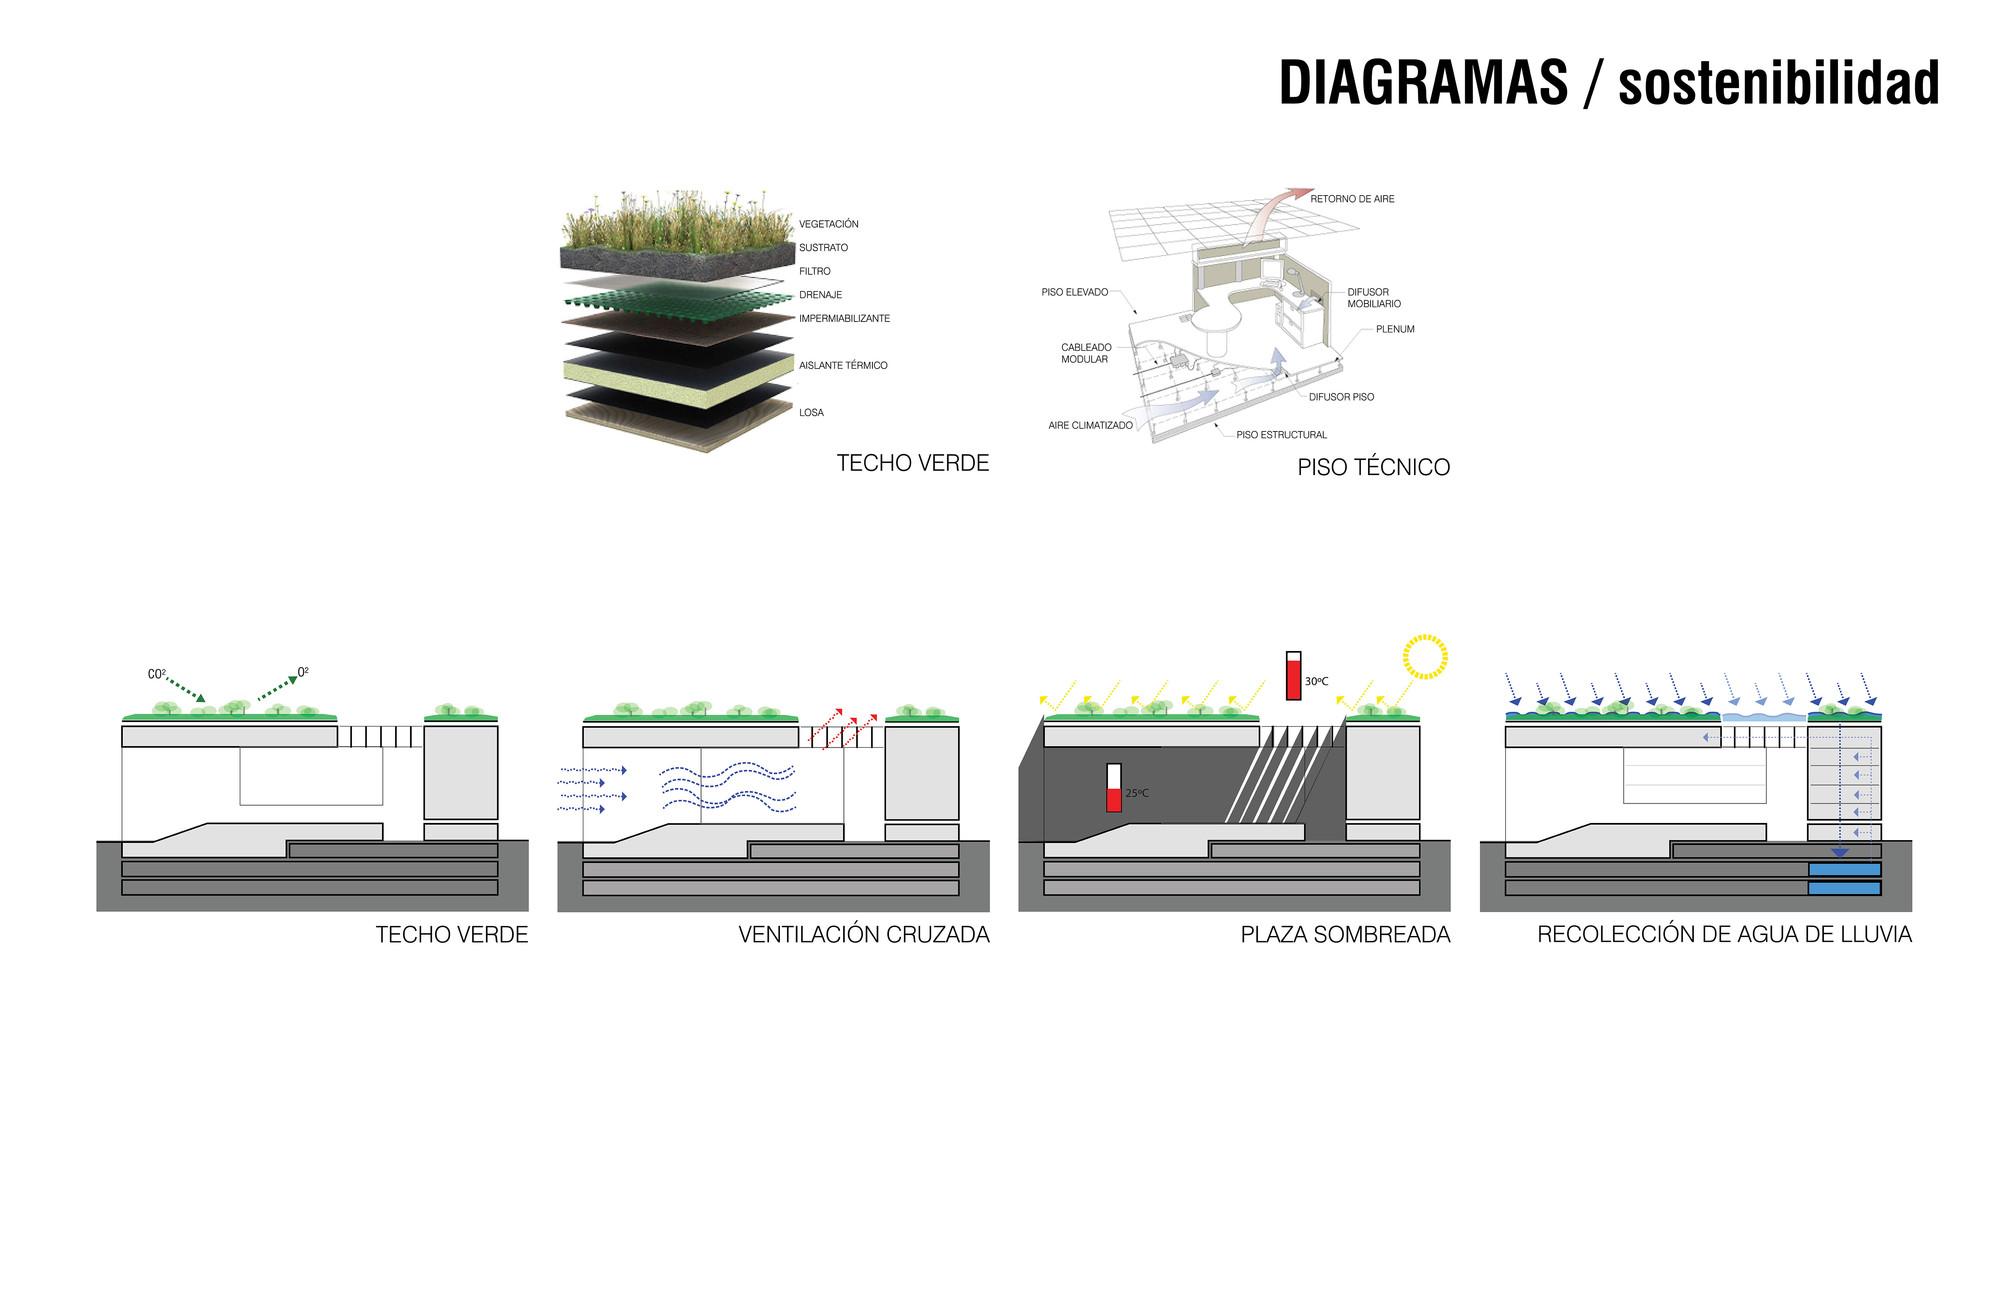 Sostenibilidad. Image Cortesia de Mallol & Mallol Arquitectos